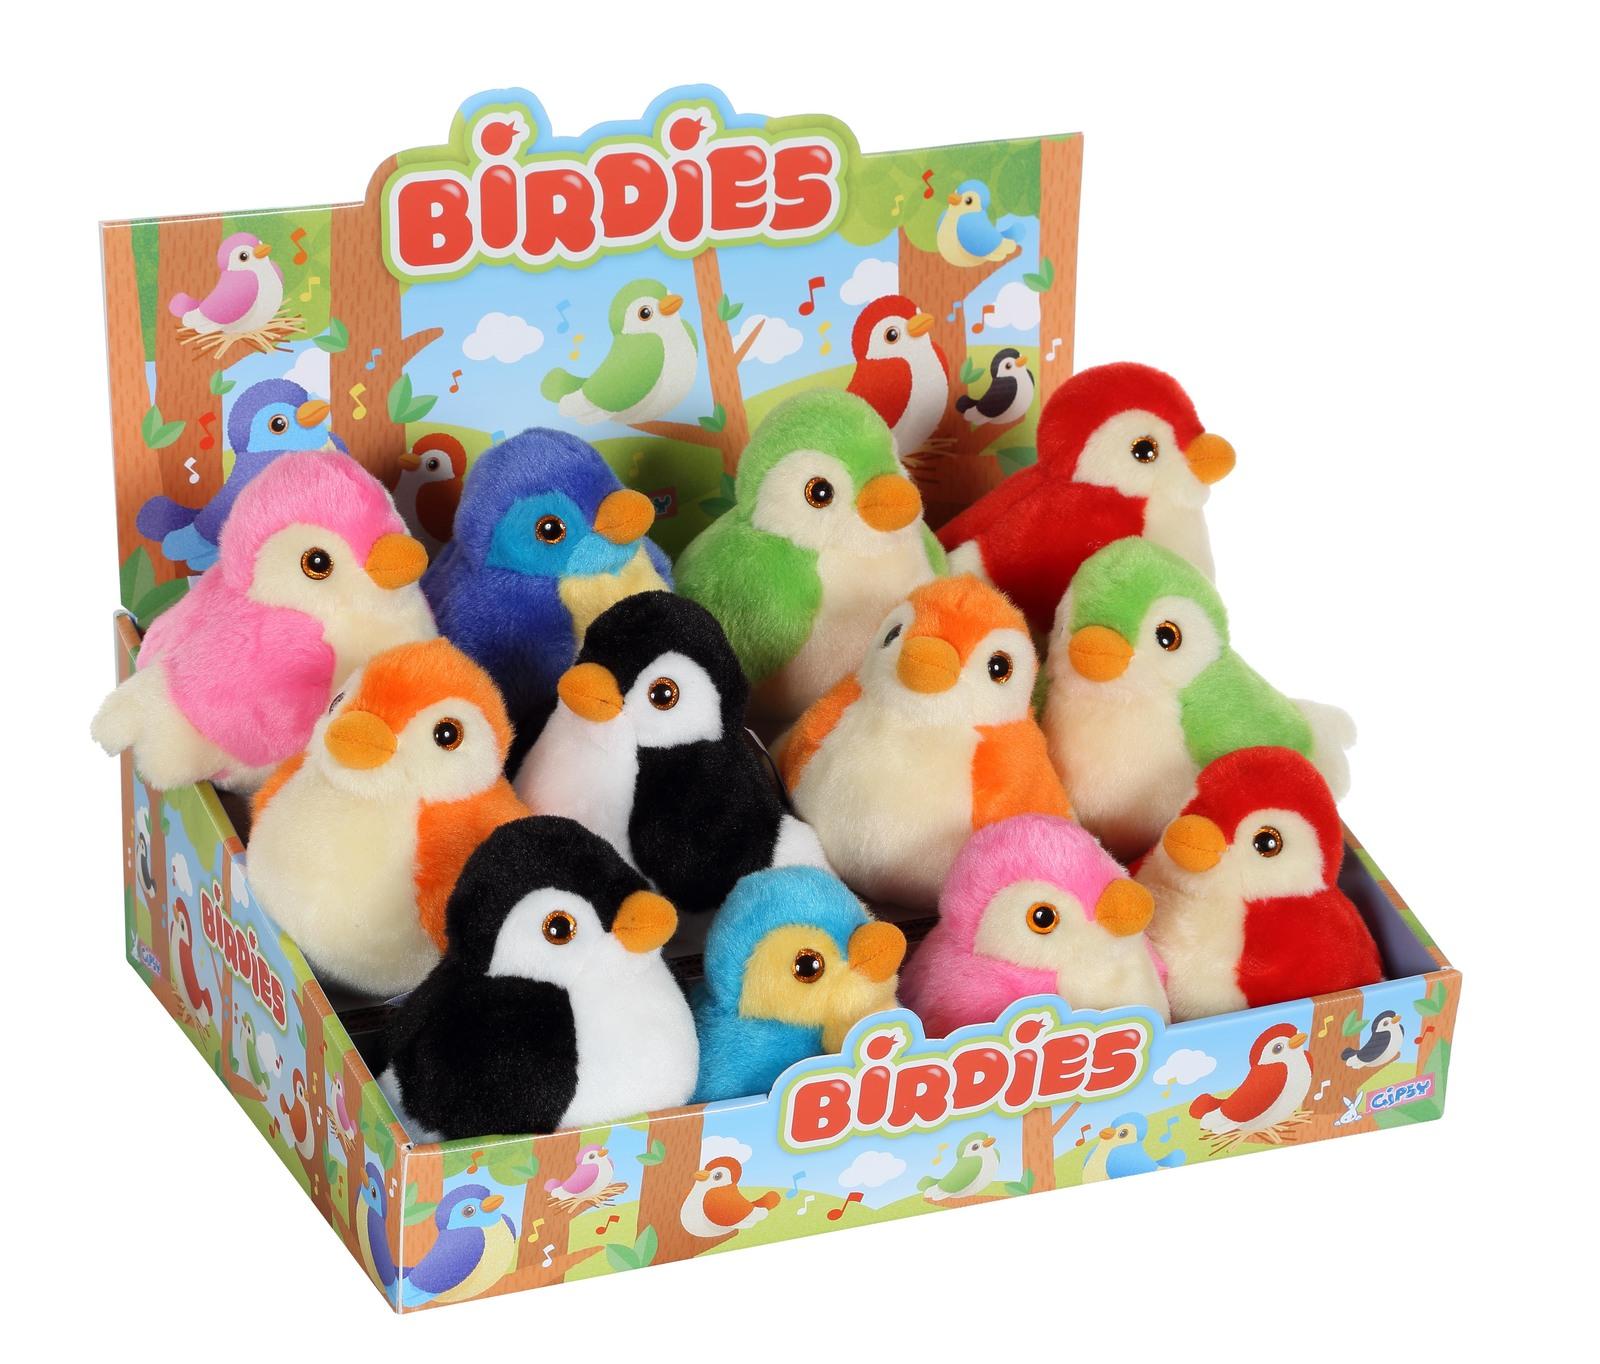 Birdie - Plush with Sound (Assorted Designs) image